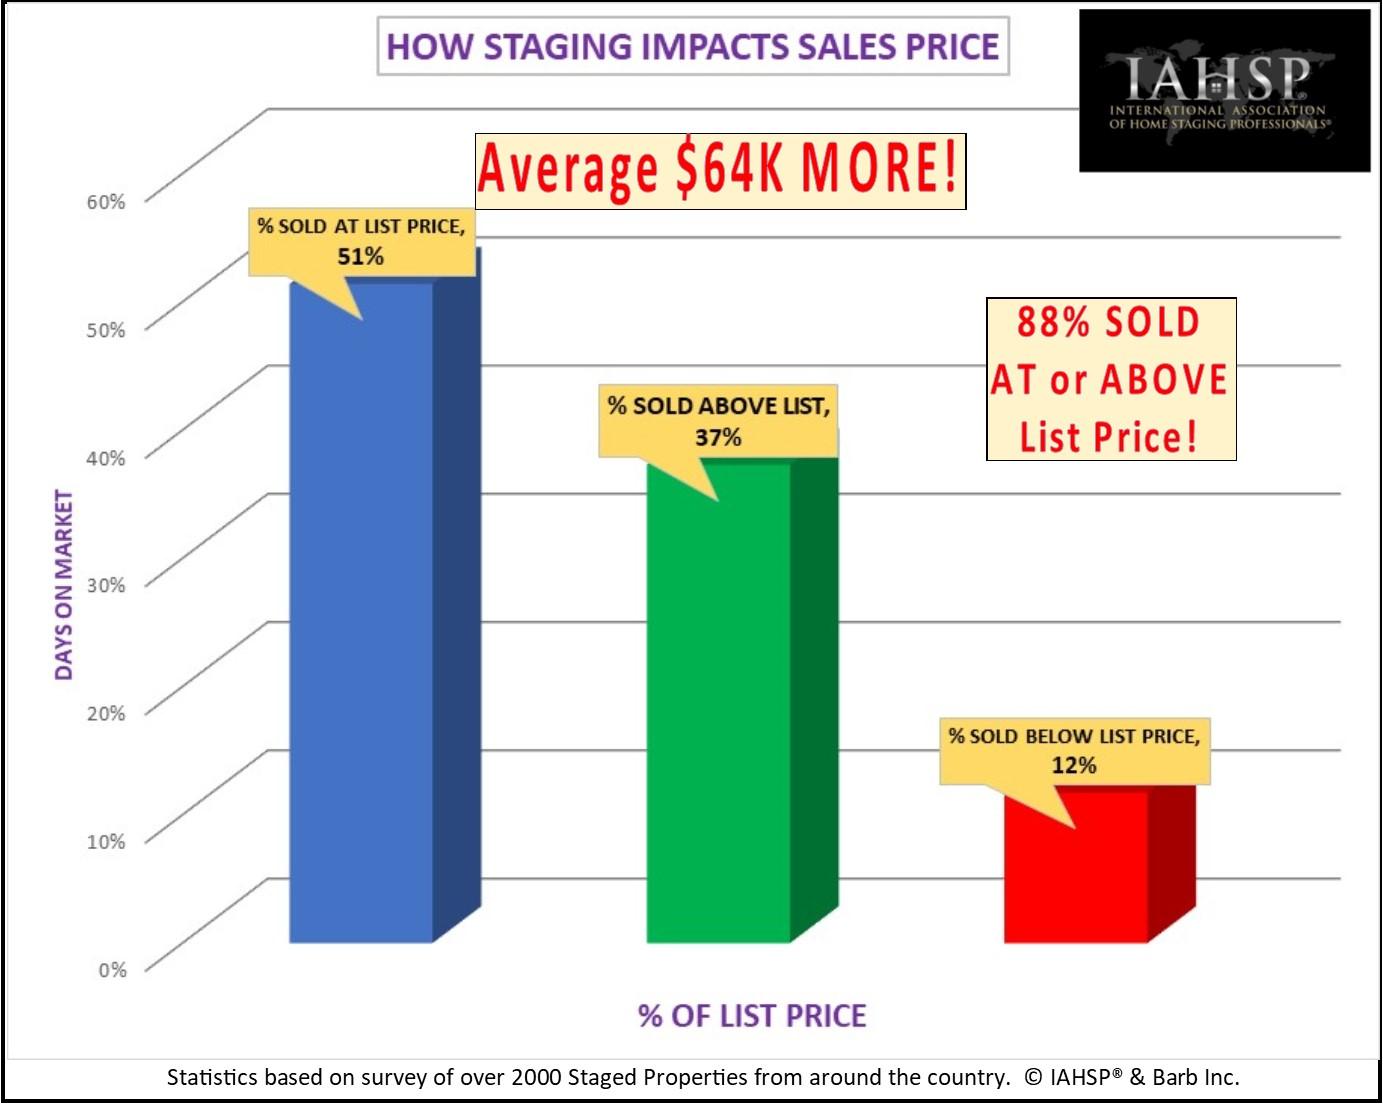 IAHSP 2018 Stats - Sales price impact